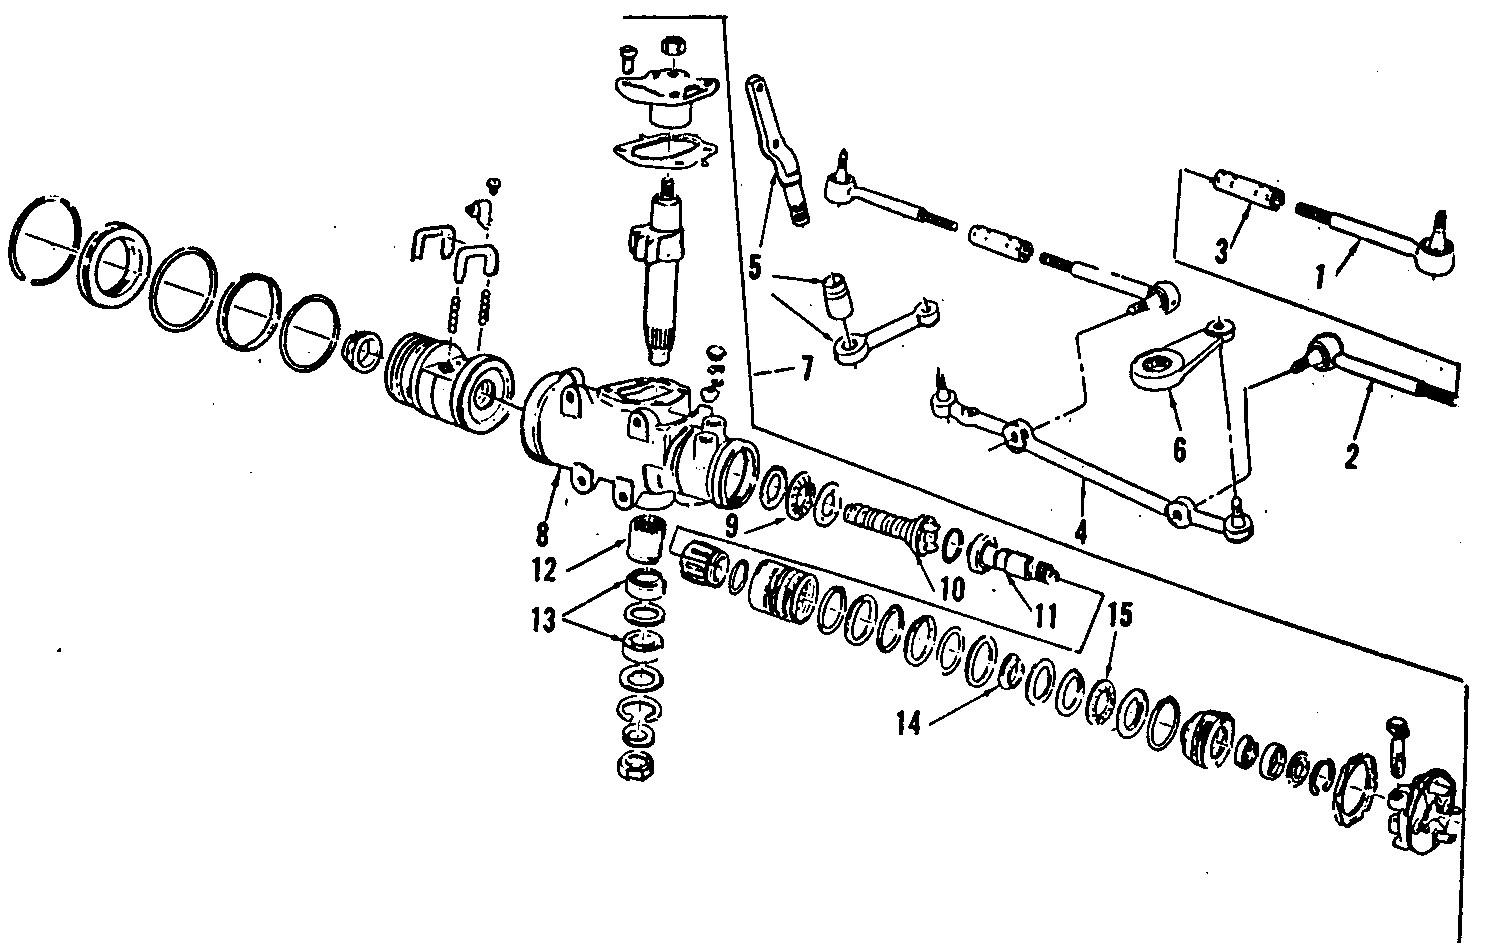 1986camaro Power Steering Pump Schematics 1986 Chevrolet K10 Power Steering Pump Seal Kit Steering Gear Seal Kit Valve Seal Kit